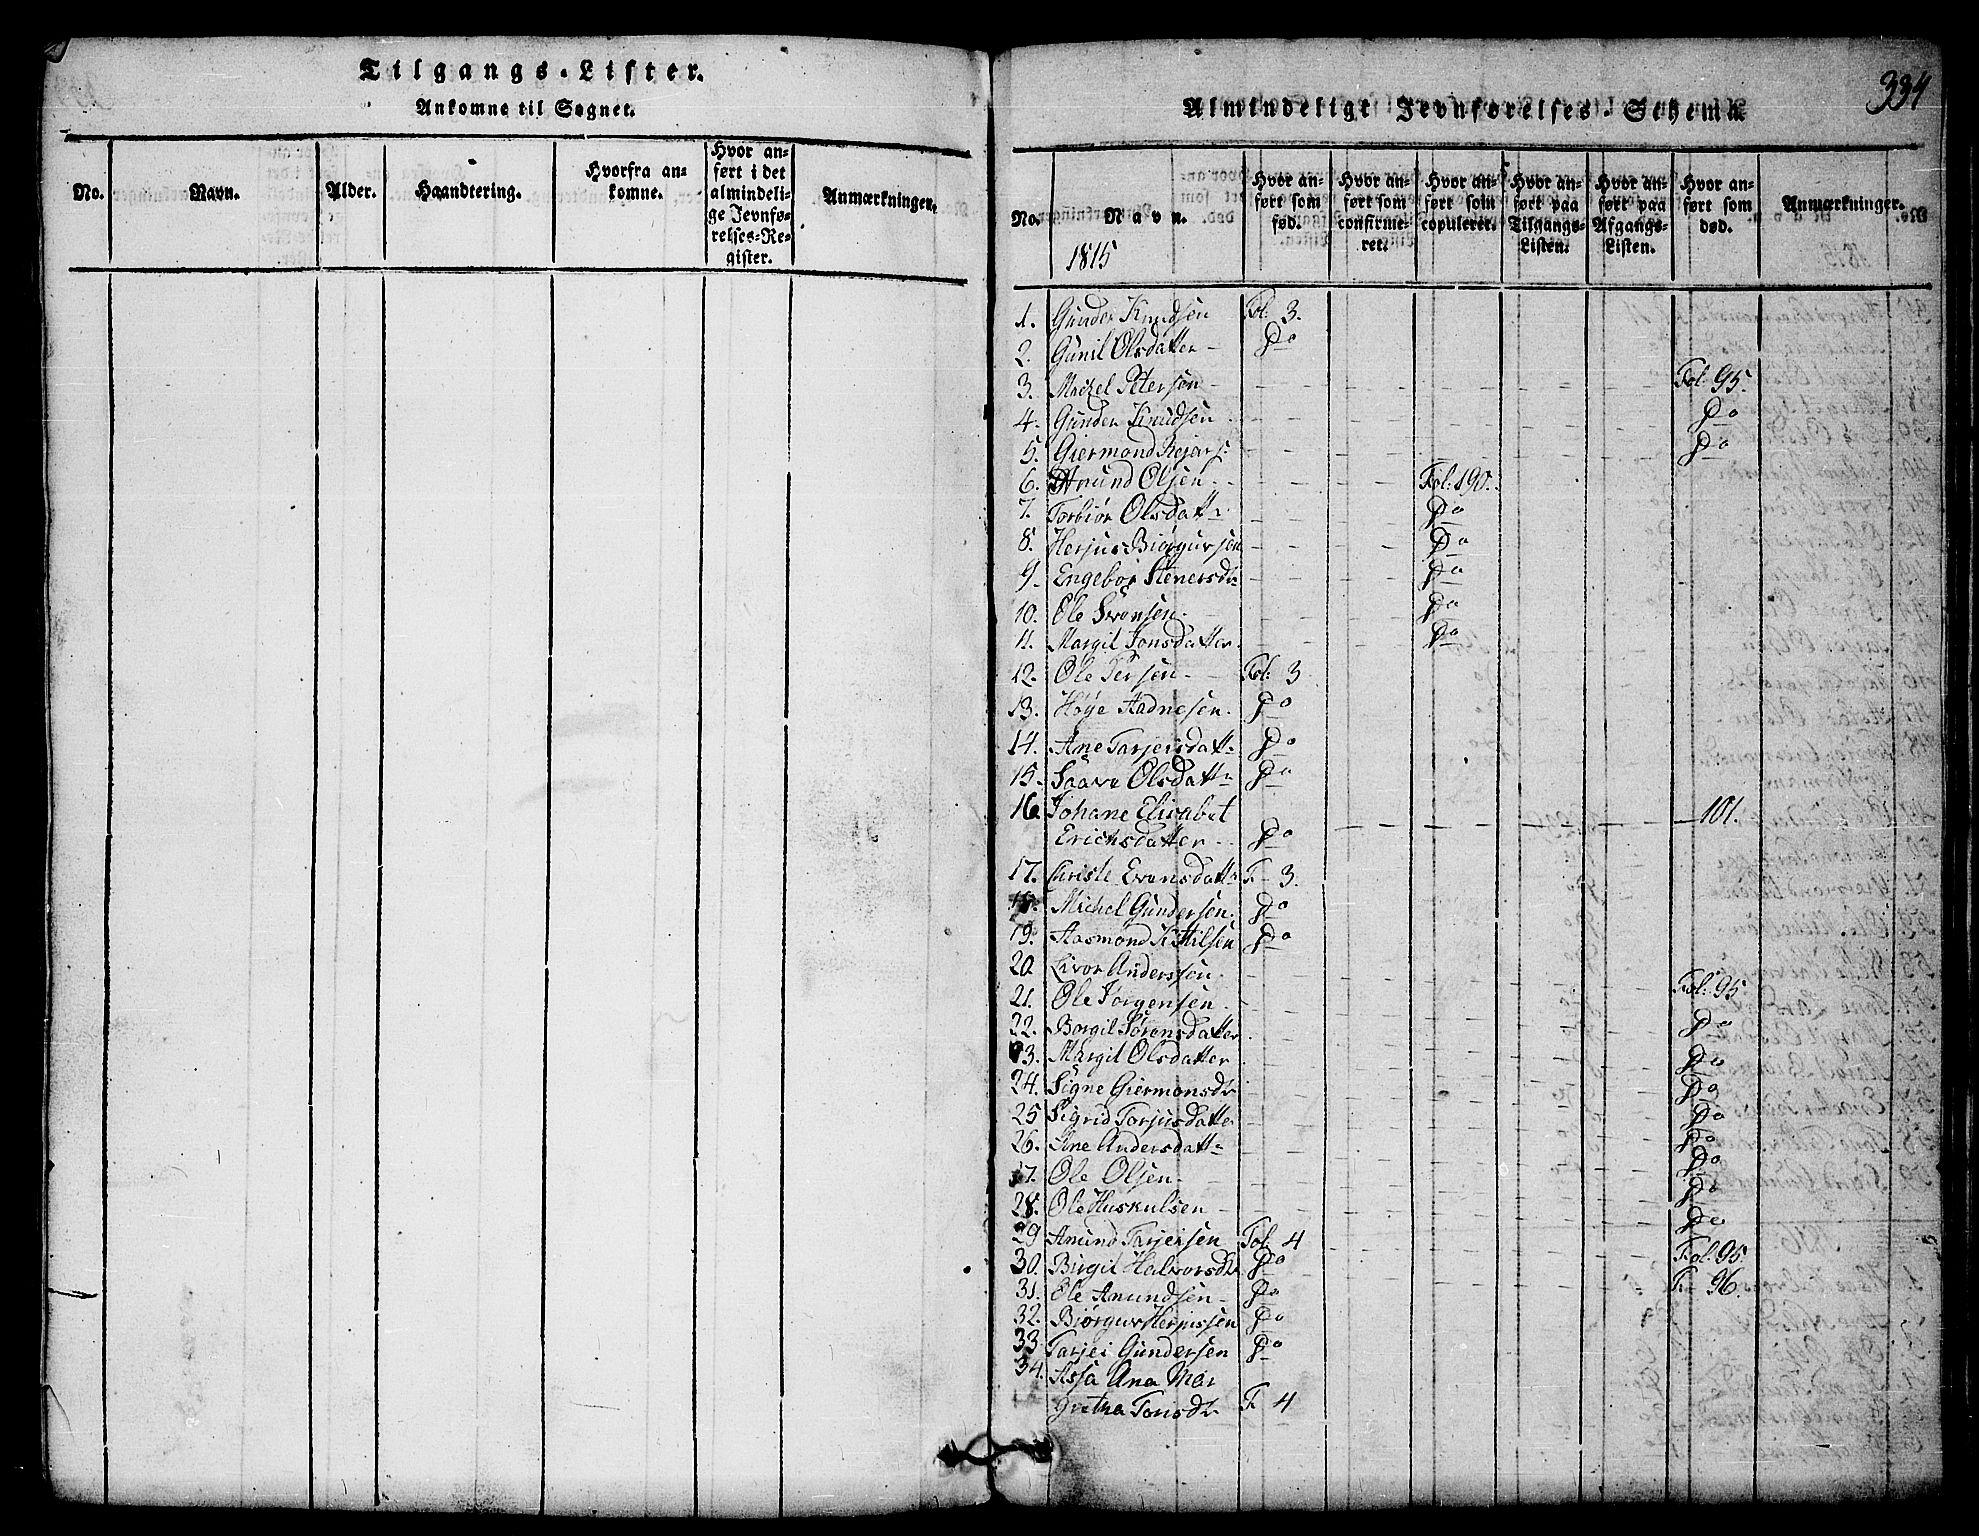 SAKO, Mo kirkebøker, G/Gb/L0001: Klokkerbok nr. II 1, 1814-1843, s. 334